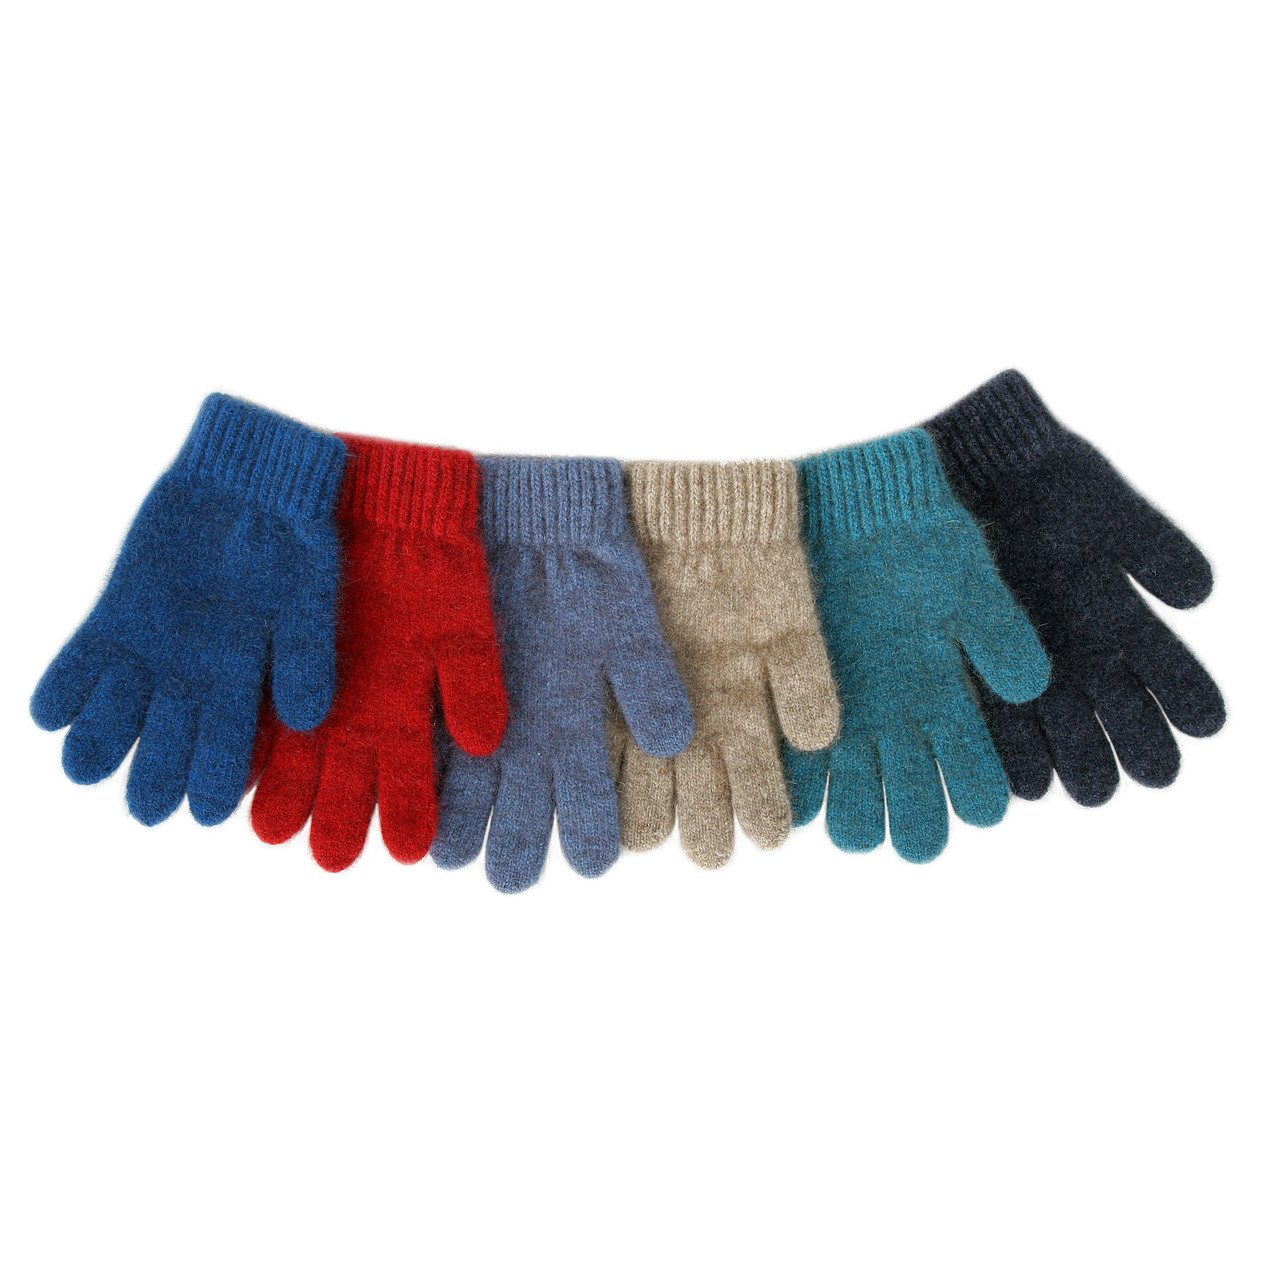 Cozy Kiwi Child's Plain Gloves - Possum Merino CK601